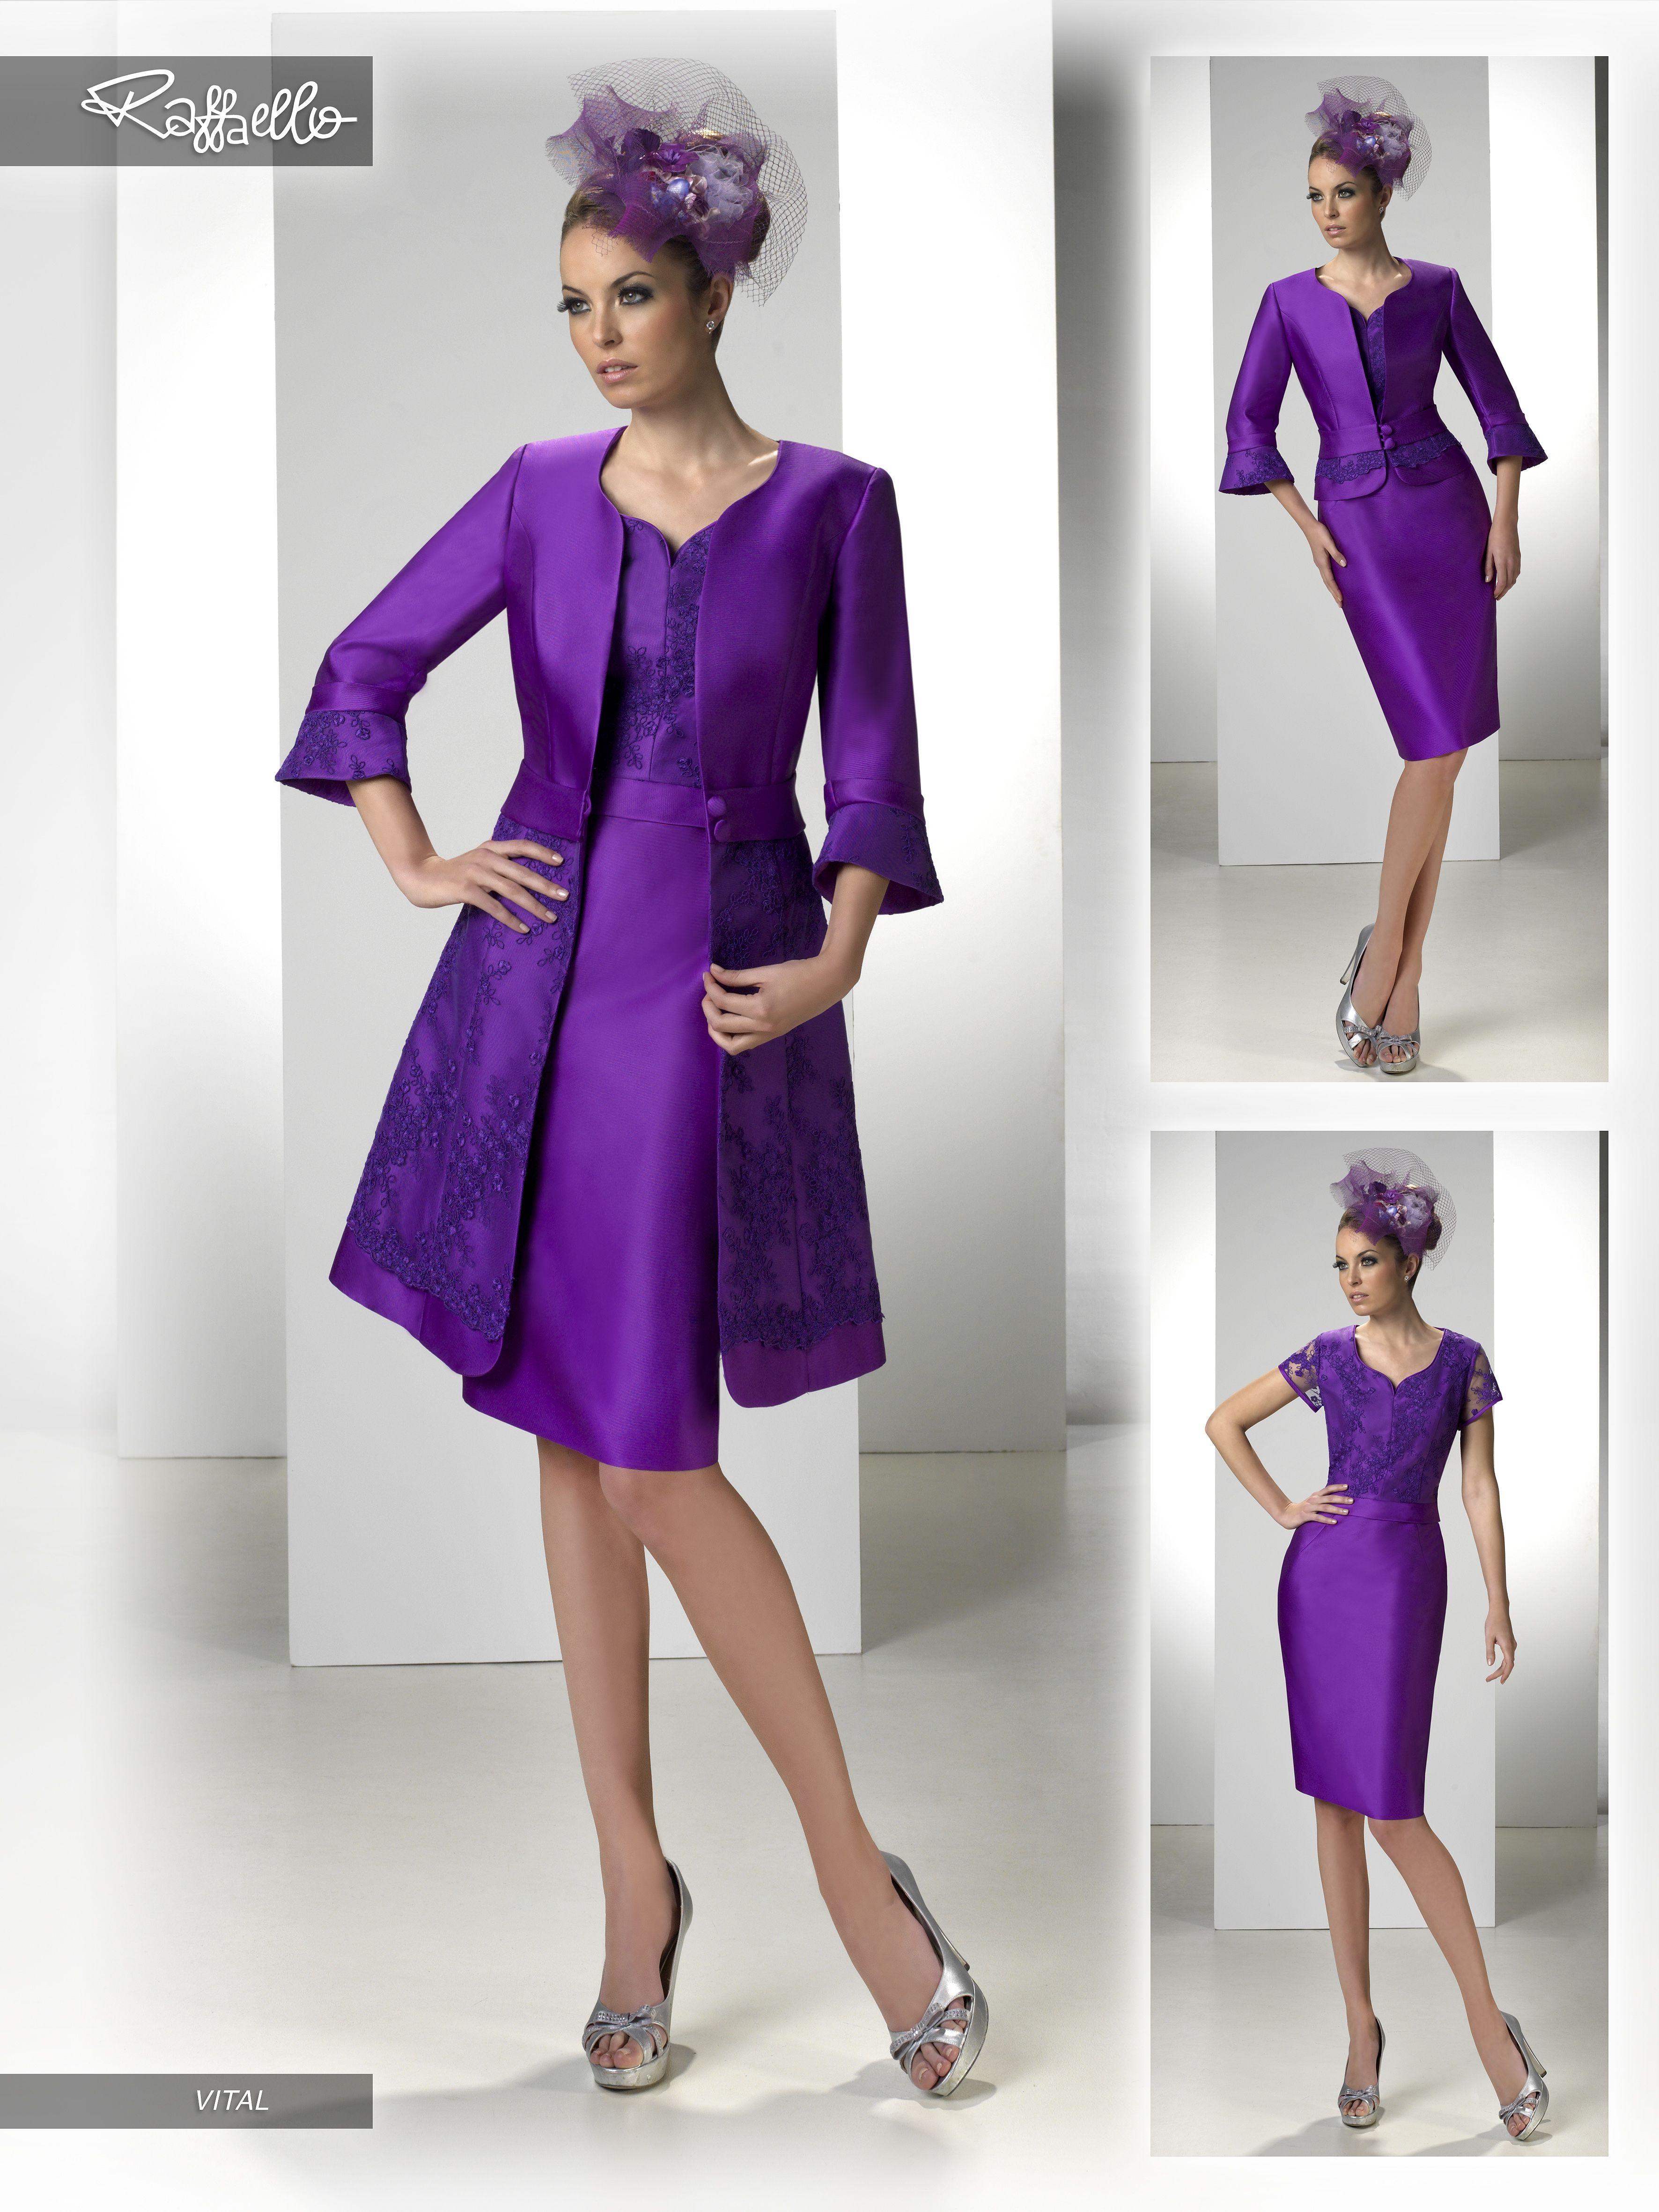 VITAL (Vestido de Fiesta). Diseñador: Raffaello. ... | modafemenina ...